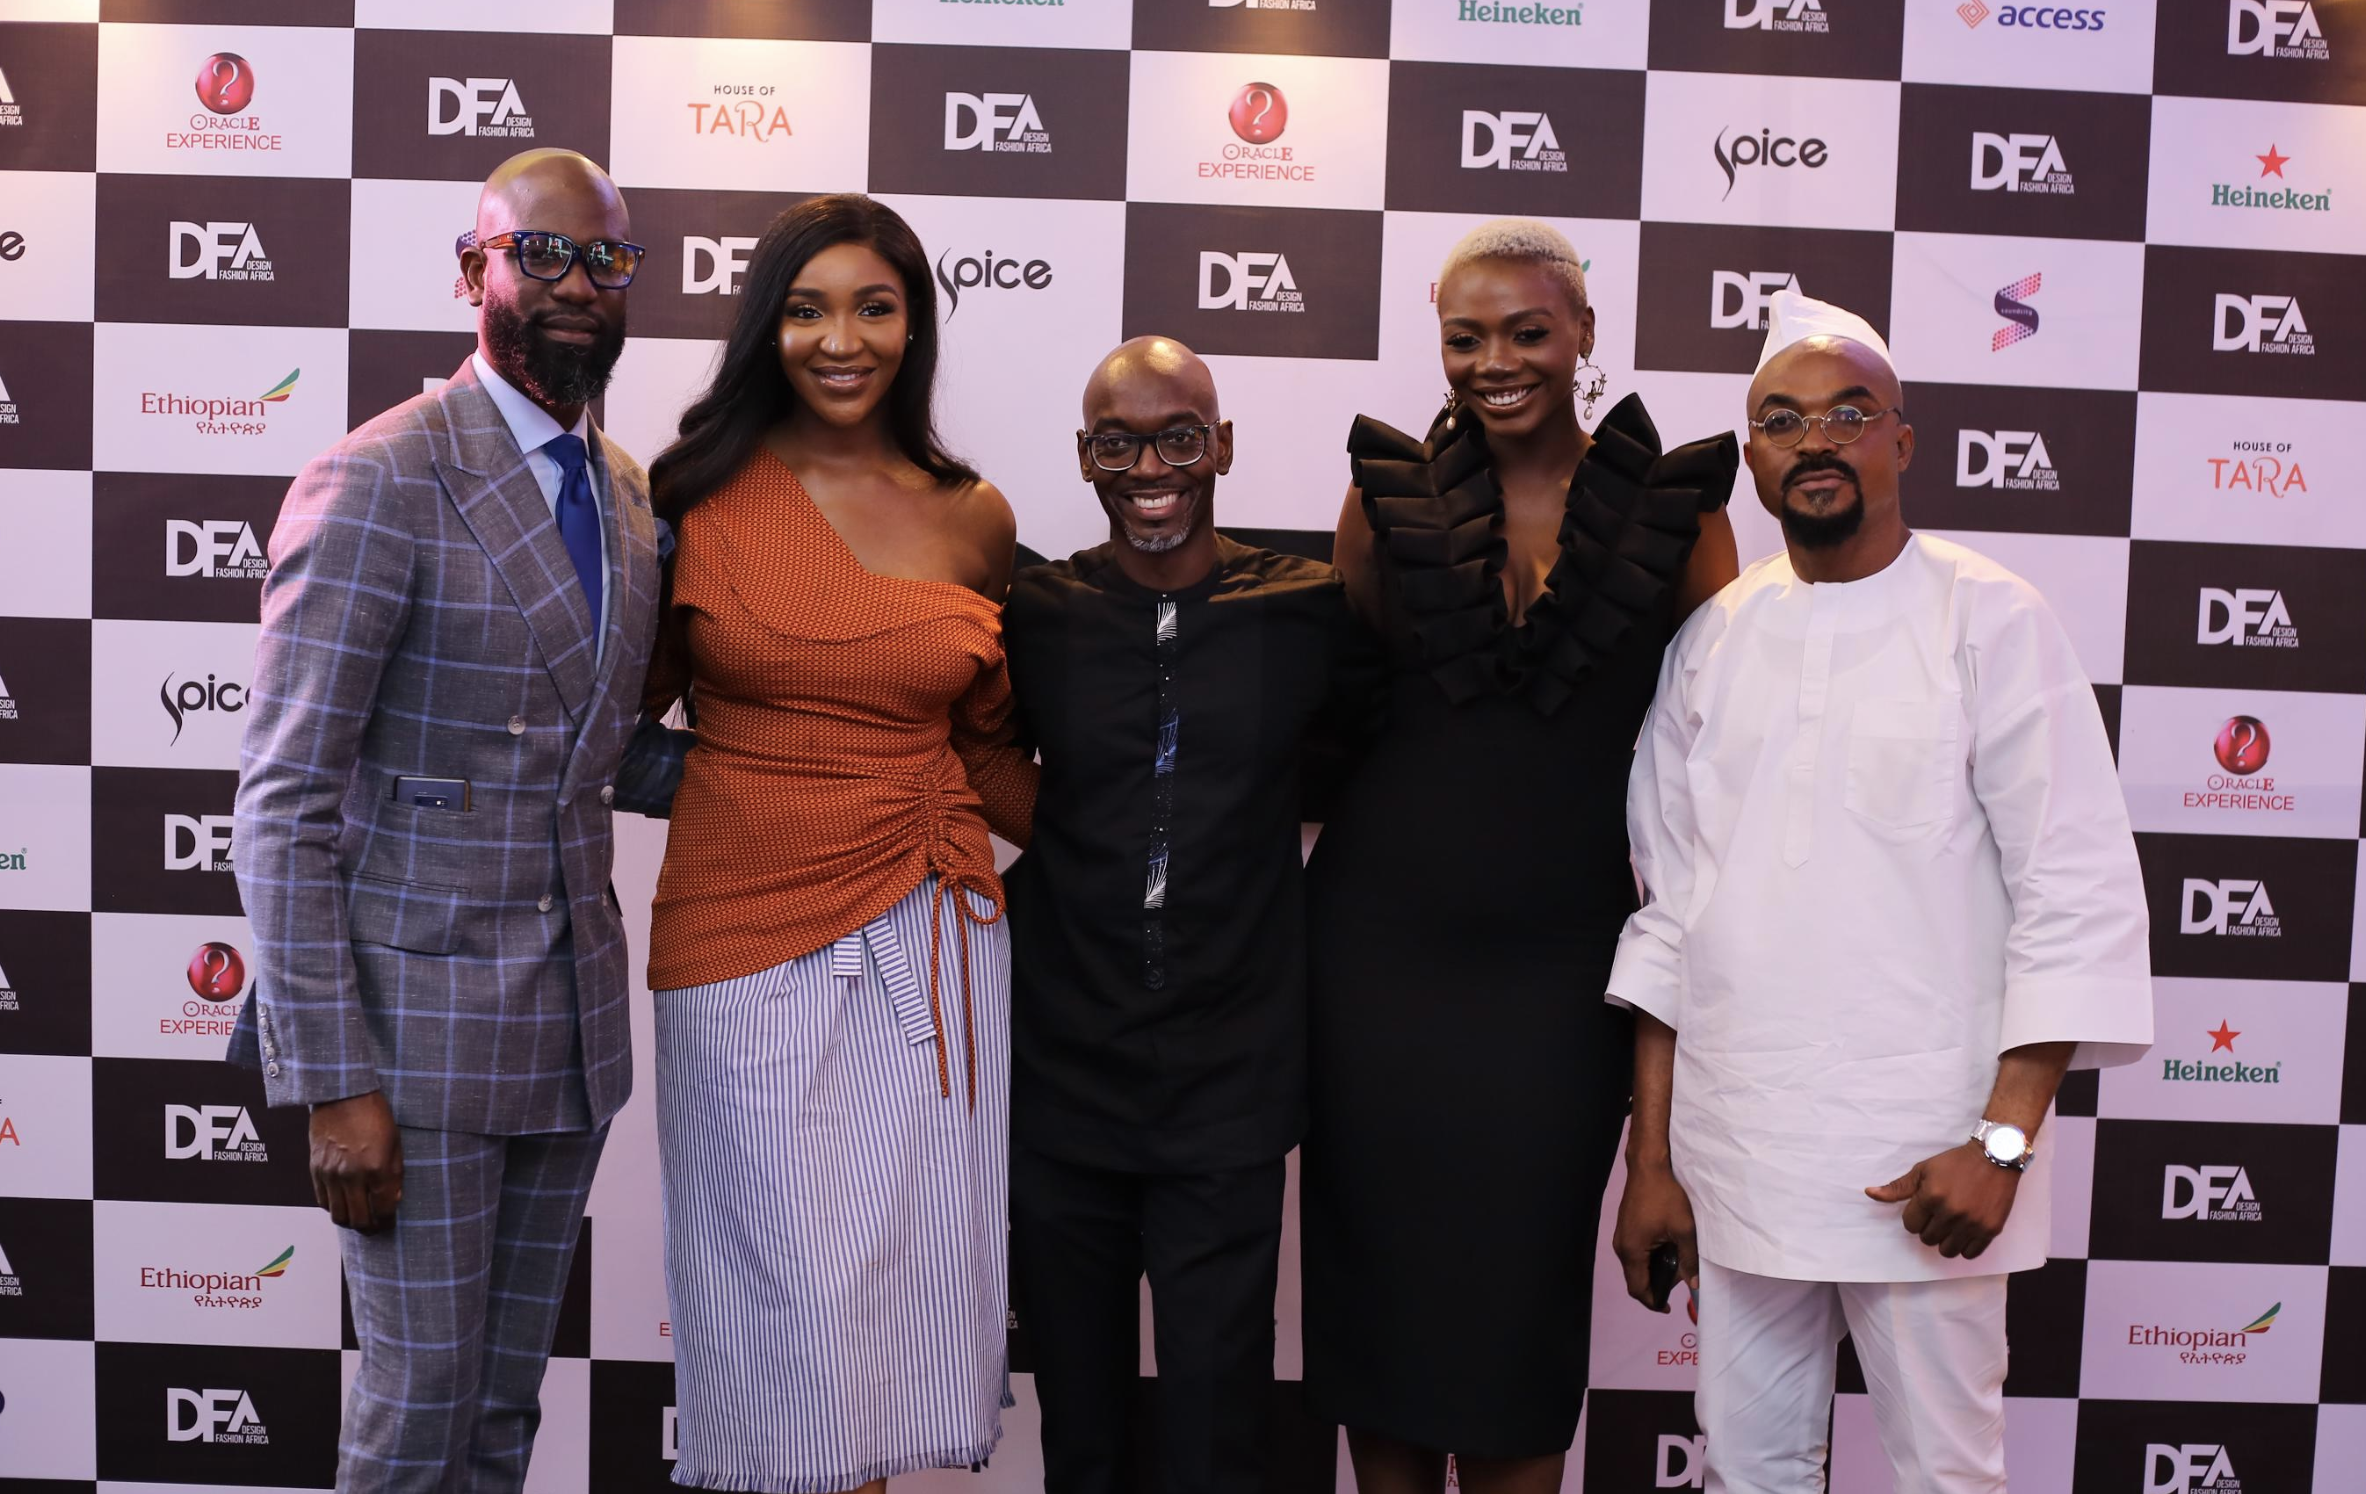 Mai Atafo and Design Fashion Africa Prepare To Crown A New Superstar Designer